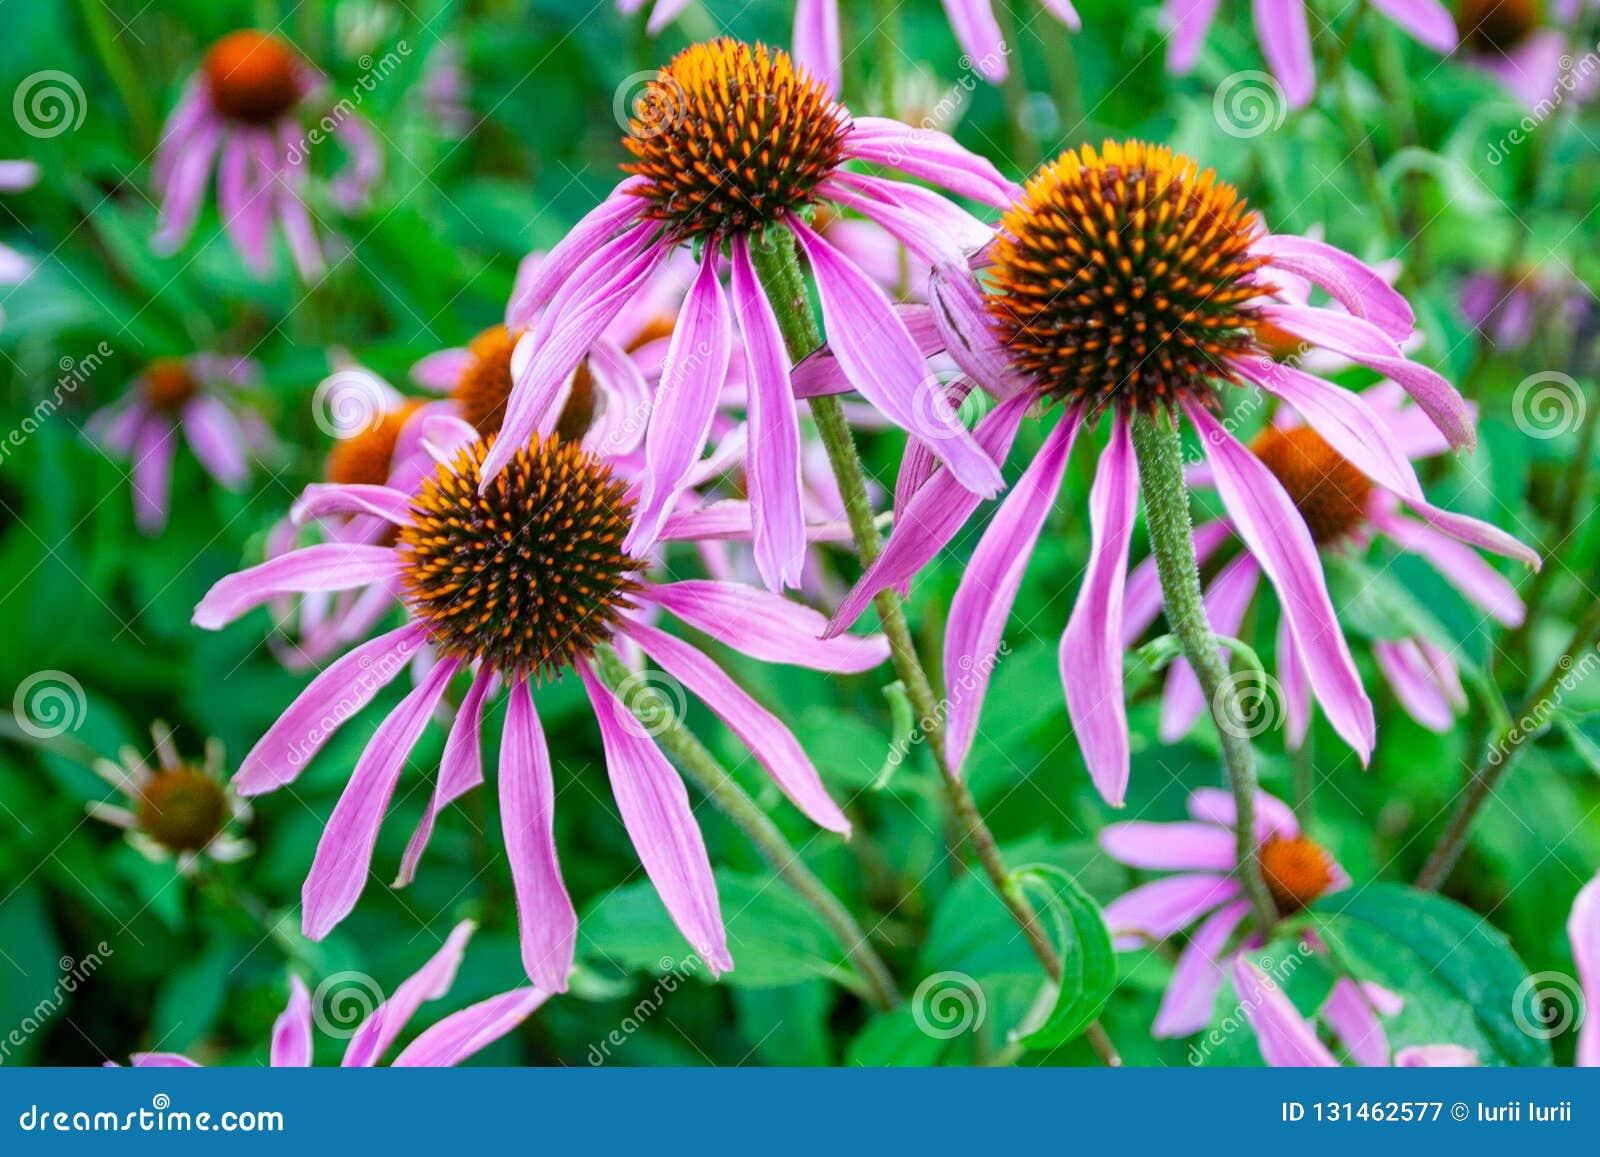 Echinacea purpurea ist ein nordamerikanisches